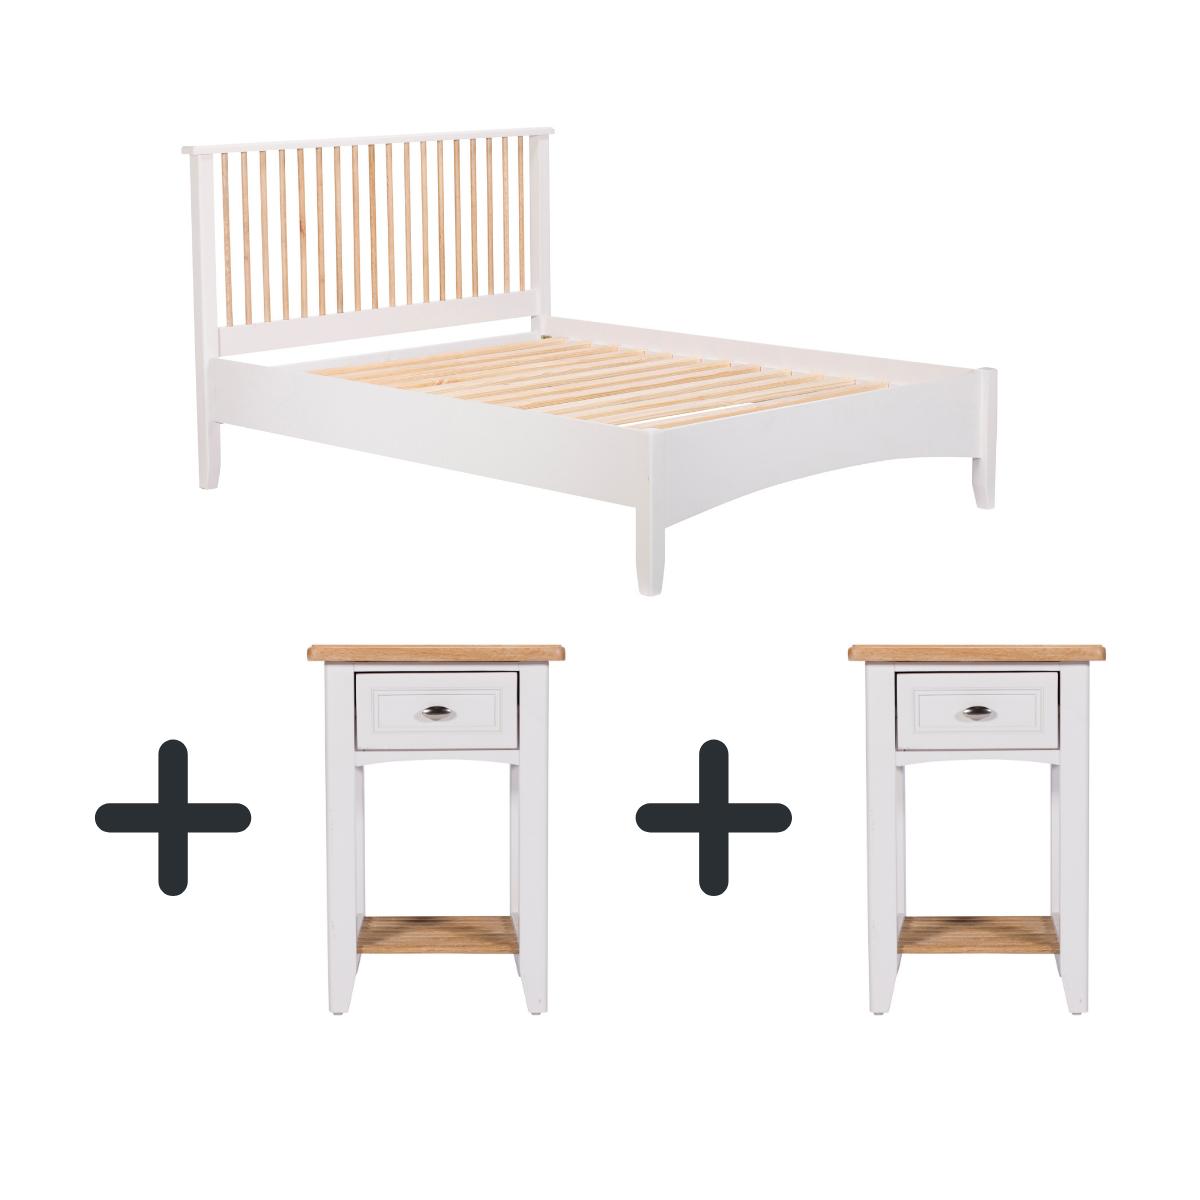 Portland Bedframe and Two Bedside Lockers - Bundle Deal